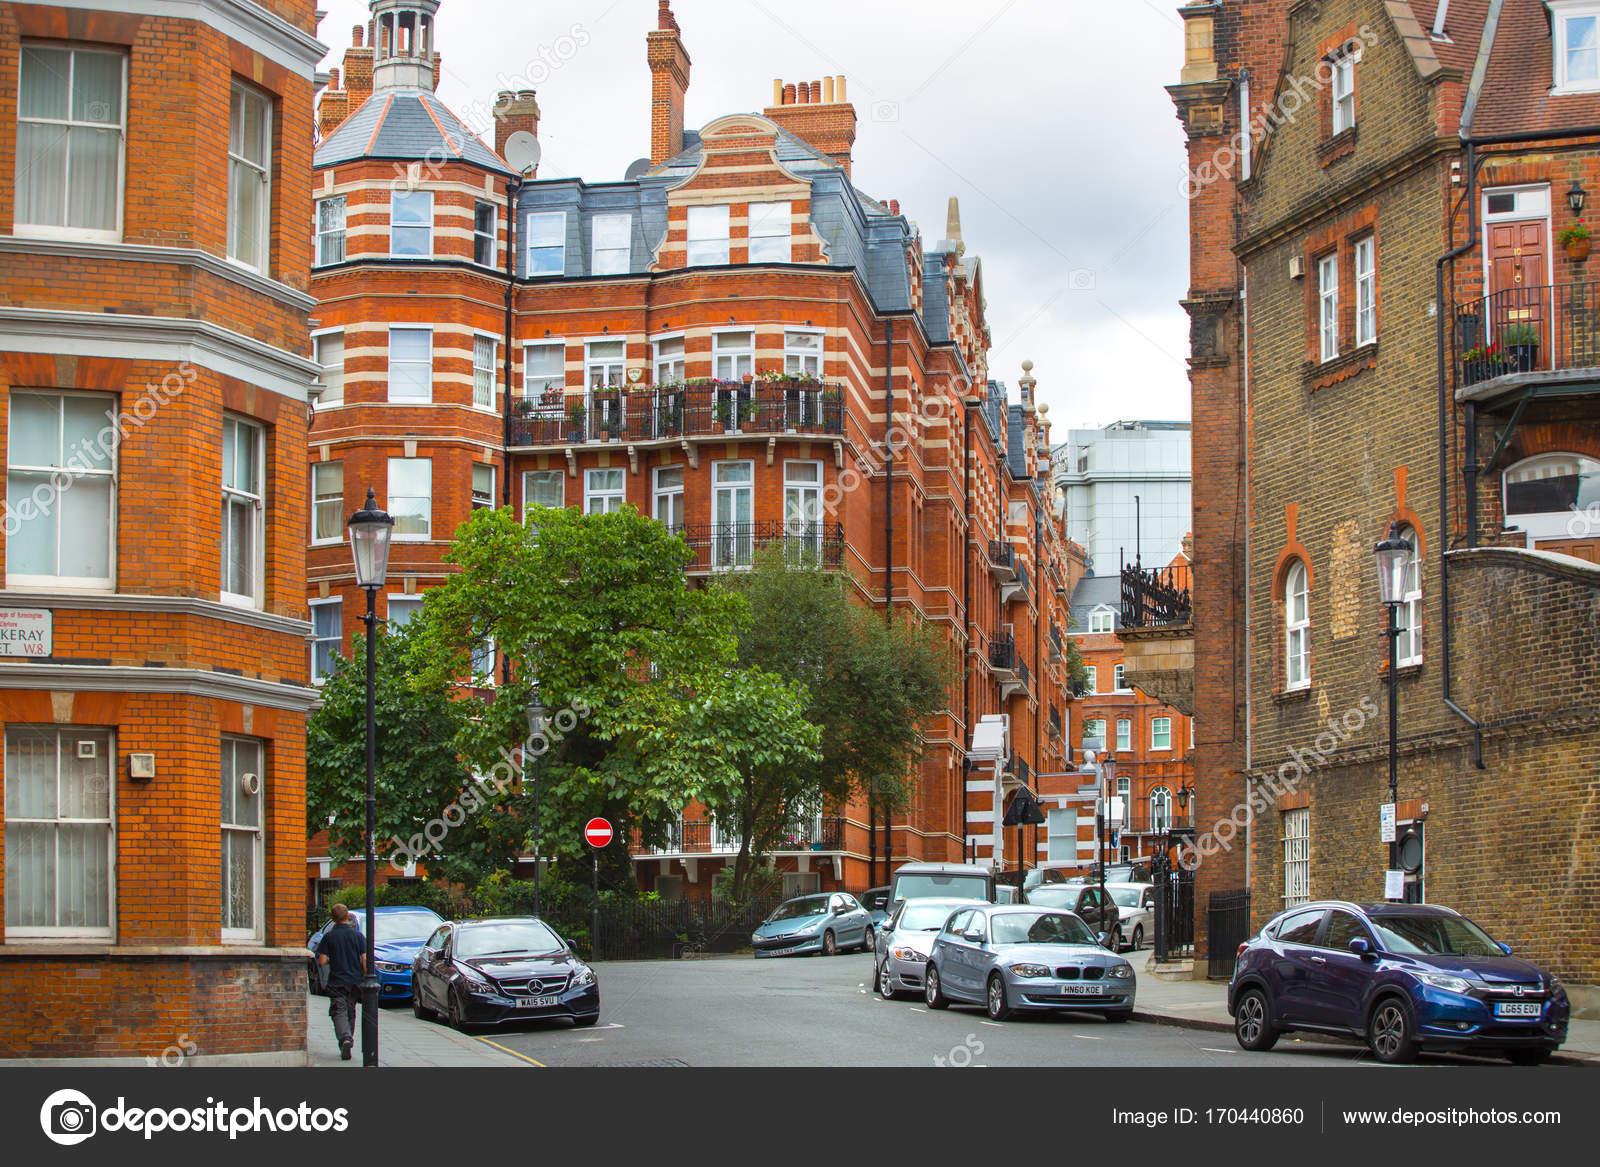 https://st3.depositphotos.com/2963315/17044/i/1600/depositphotos_170440860-stock-photo-luxury-apartment-buildings-in-kensington.jpg